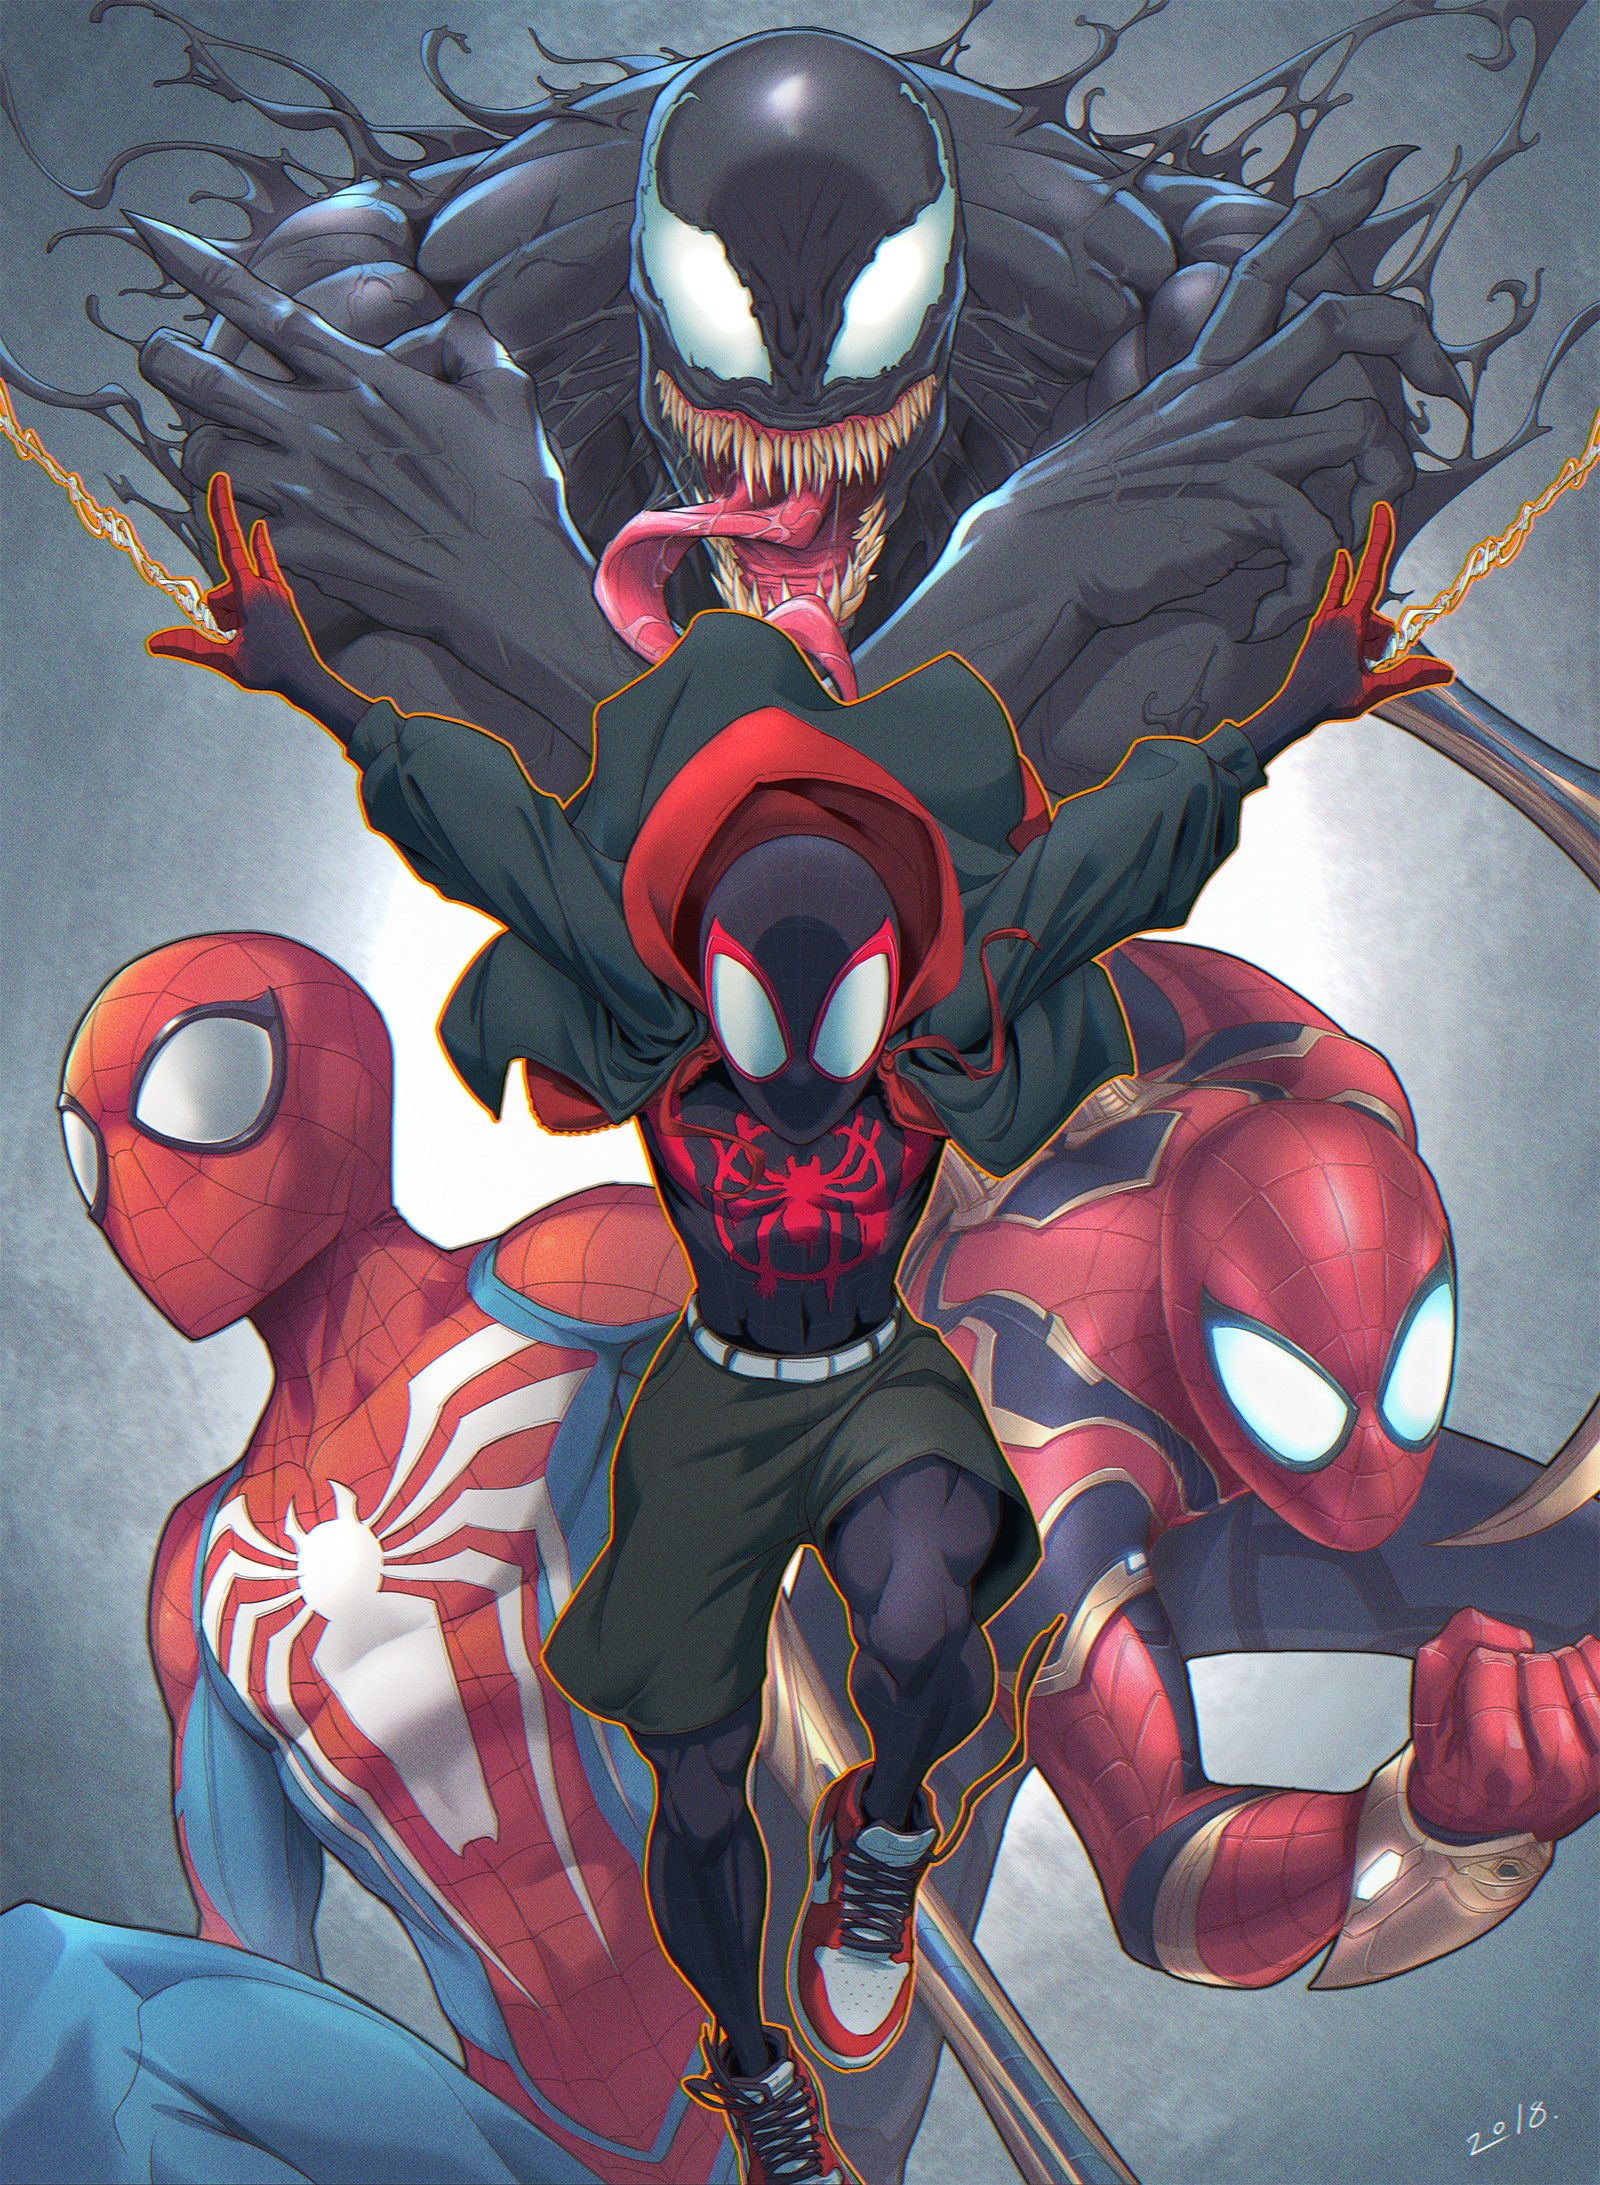 Spiderman, Peihao Wang